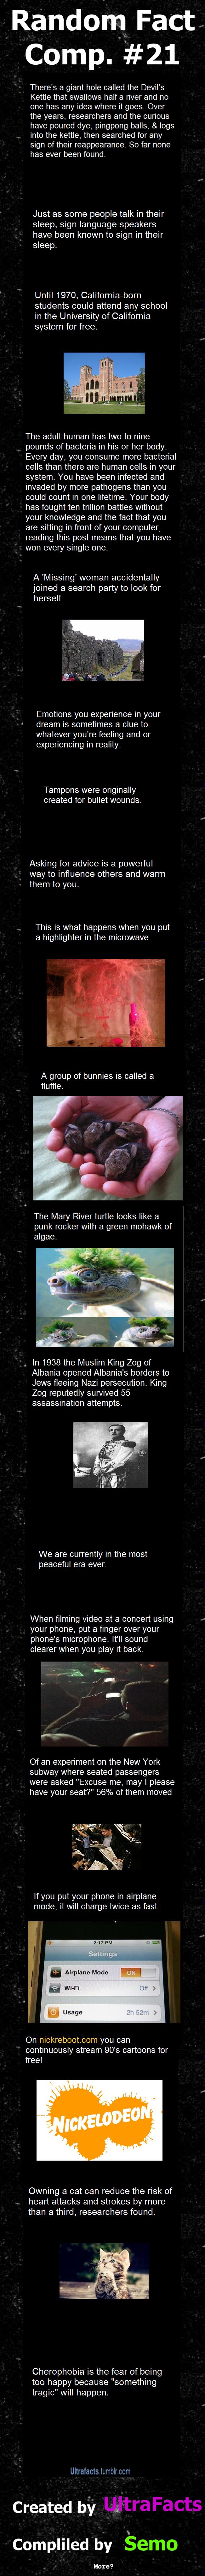 Random Fact Comp. 21. Number 10: www.funnyjunk.com/Random+Fact+Comp+10/funny-pictures/5119282/ Number 11: www.funnyjunk.com/Random+Fact+Comp+11/funny-pictures/5